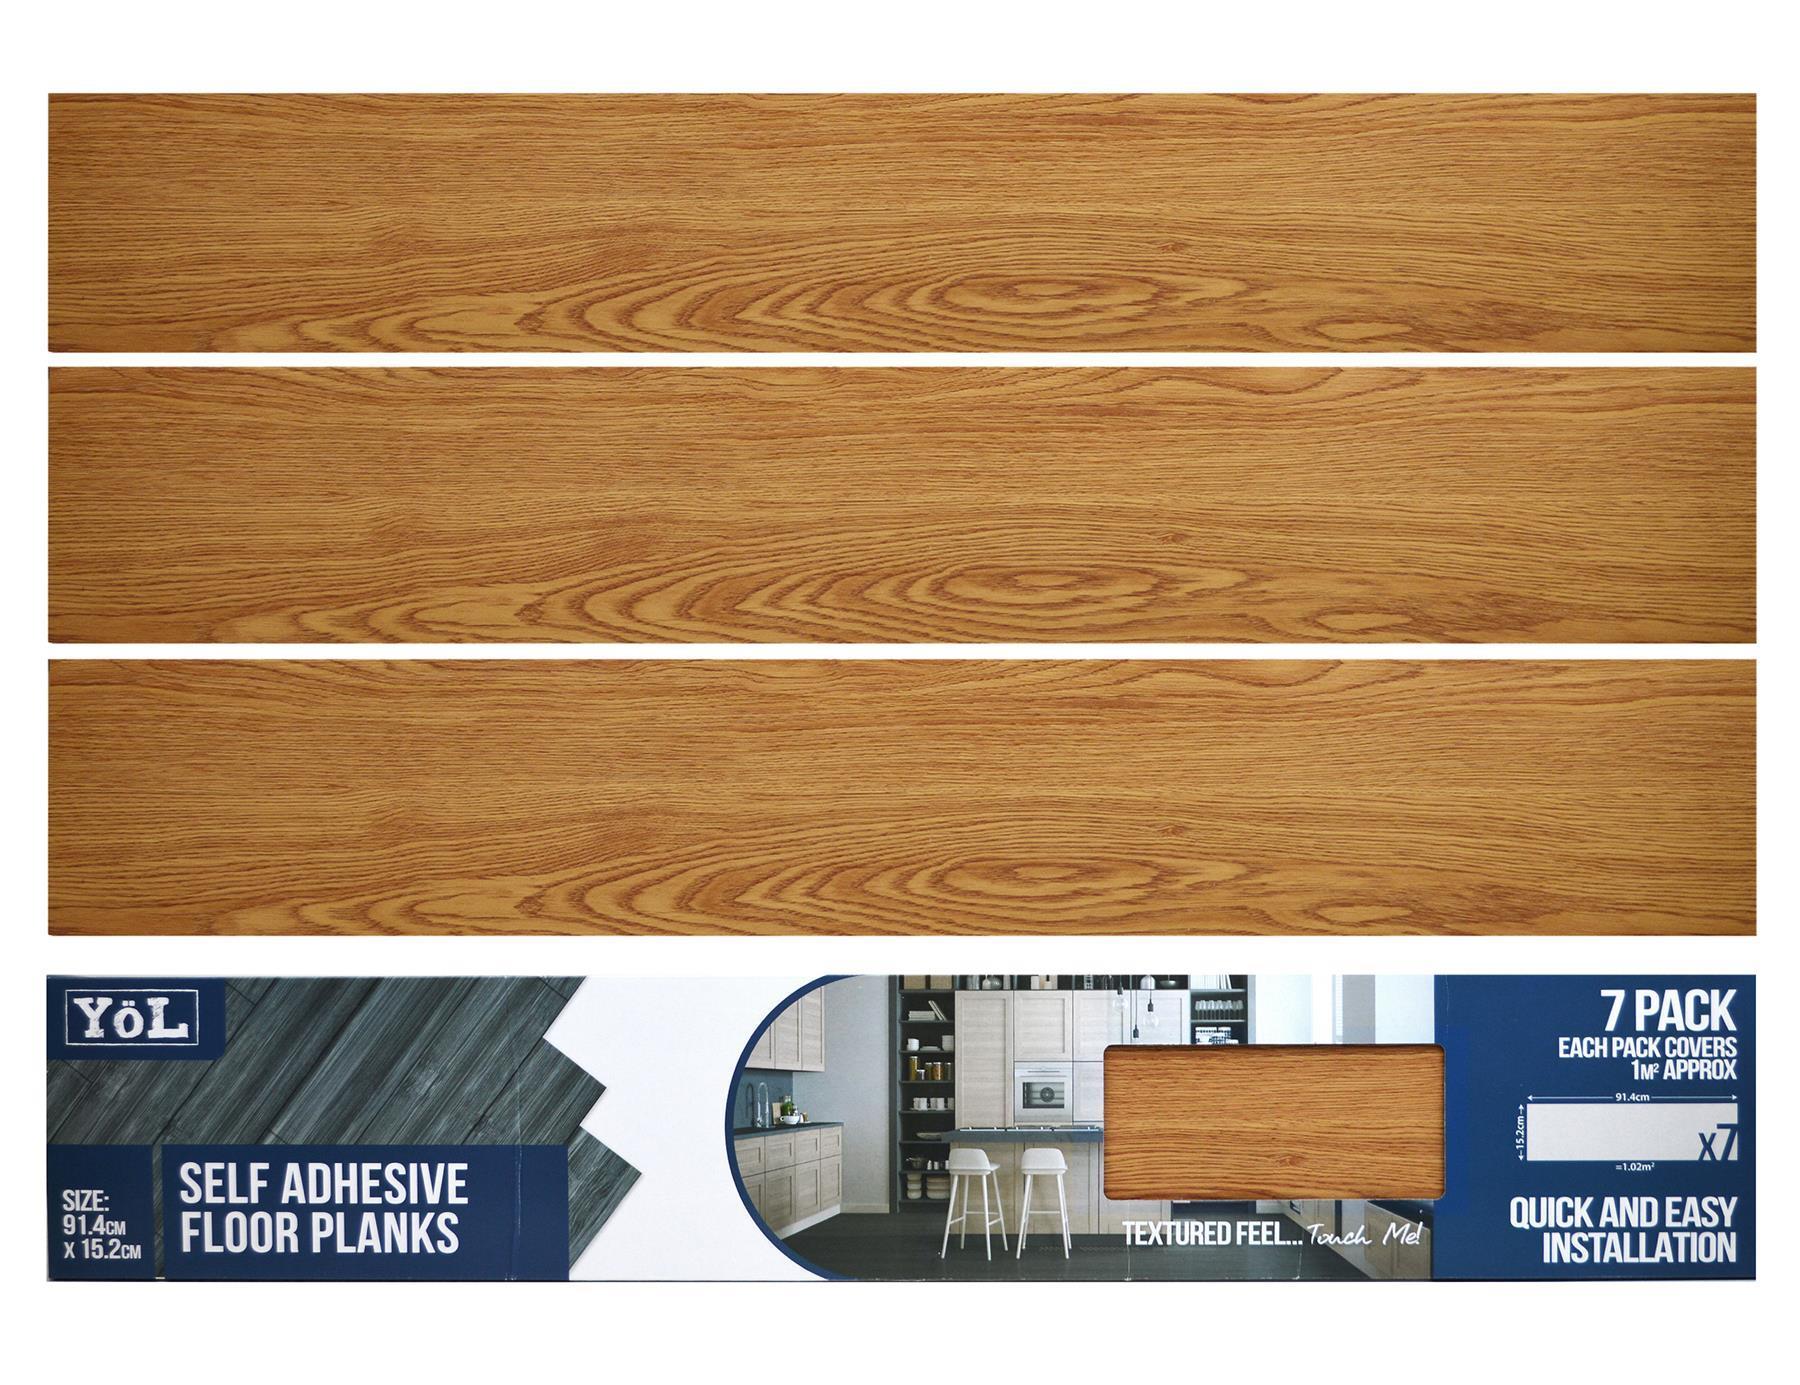 thumbnail 10 - Floor Planks Tiles Self Adhesive Vinyl Brown Wood Flooring Kitchen Bathroom